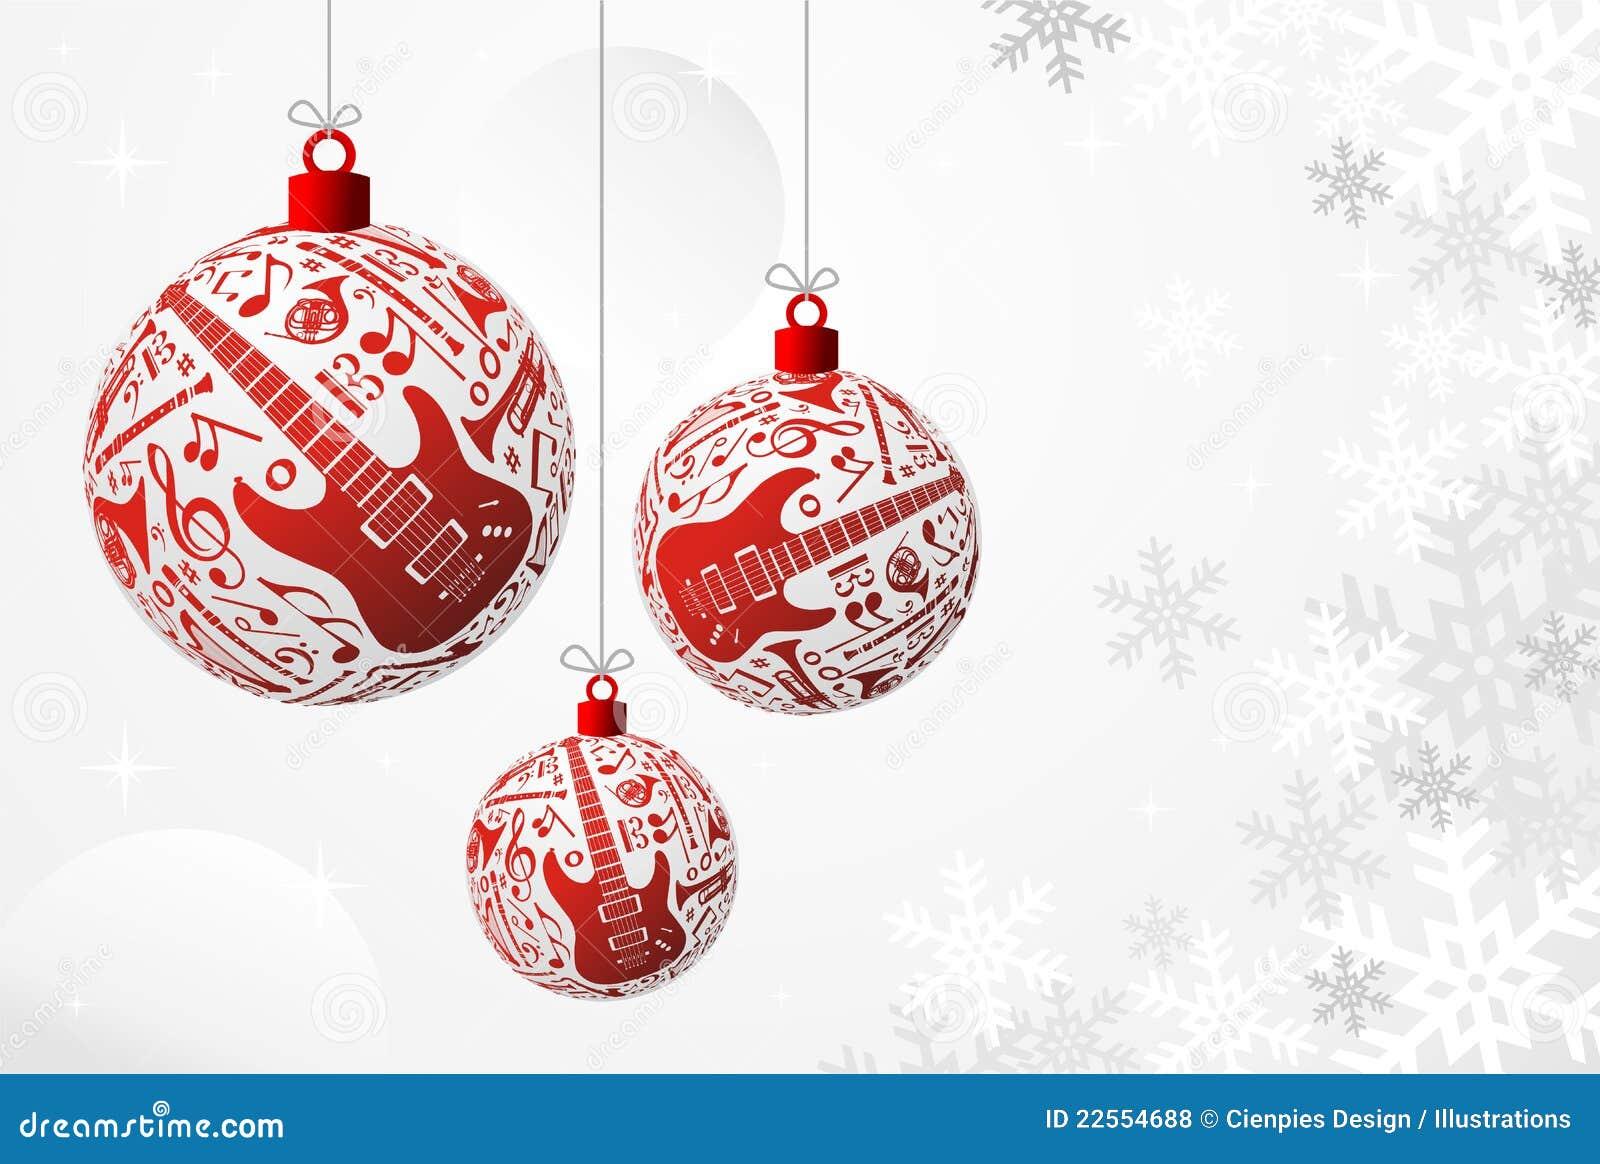 Music Christmas card stock vector. Illustration of musical - 22554688